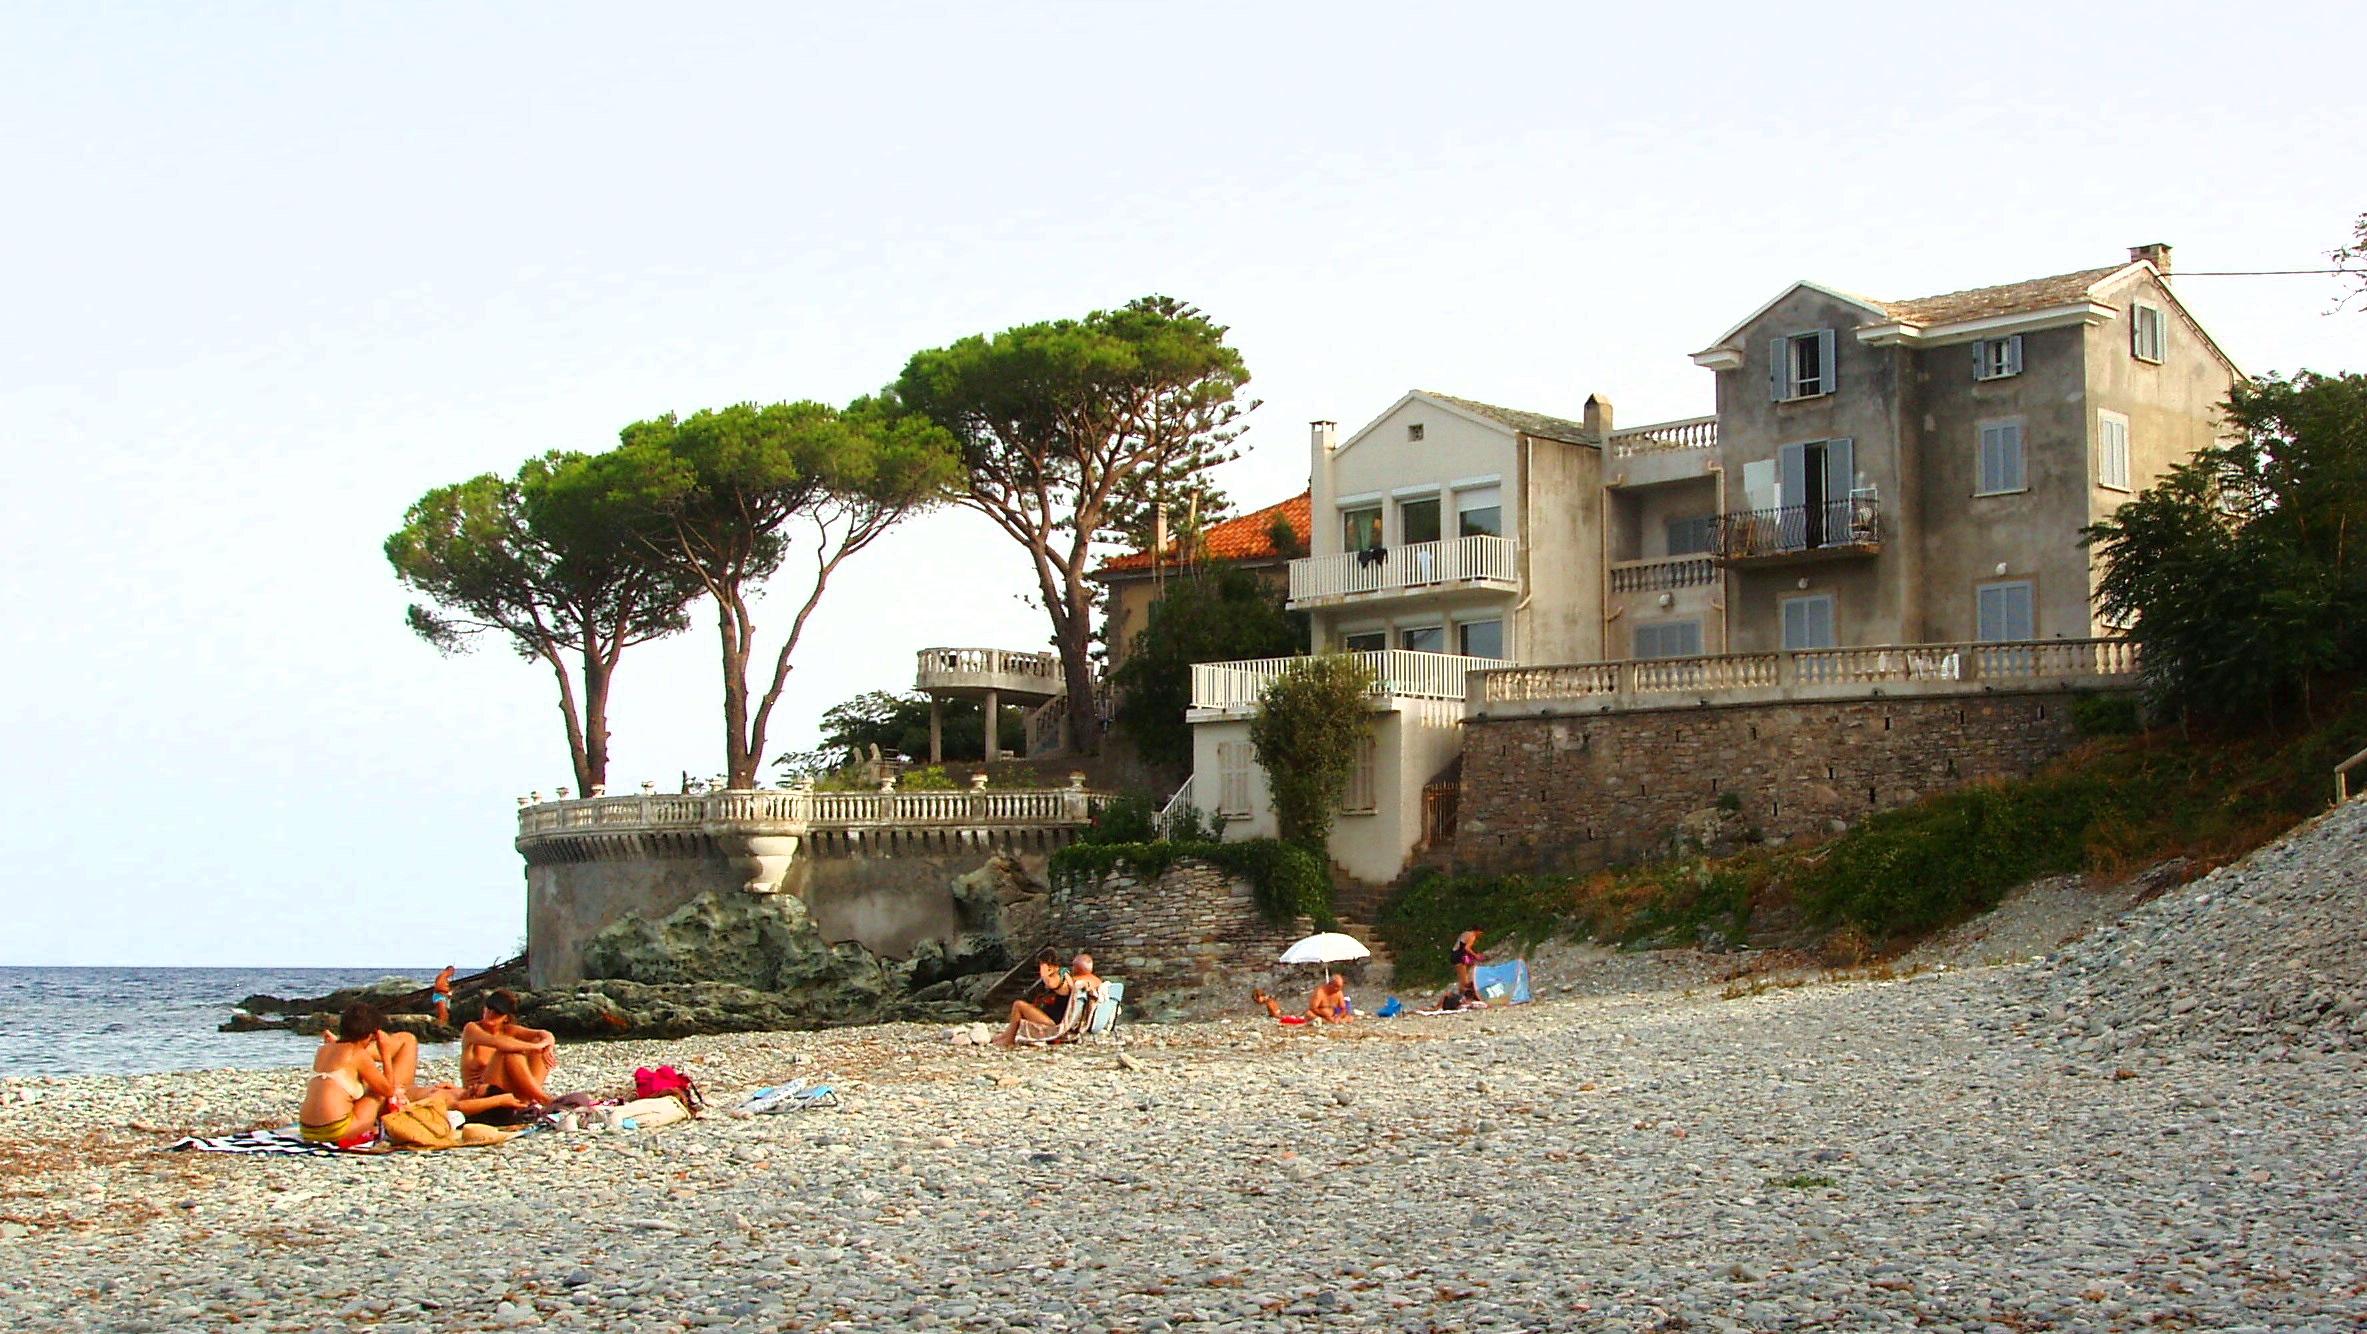 Beach in Corsica - photo:Lillian Kennedy